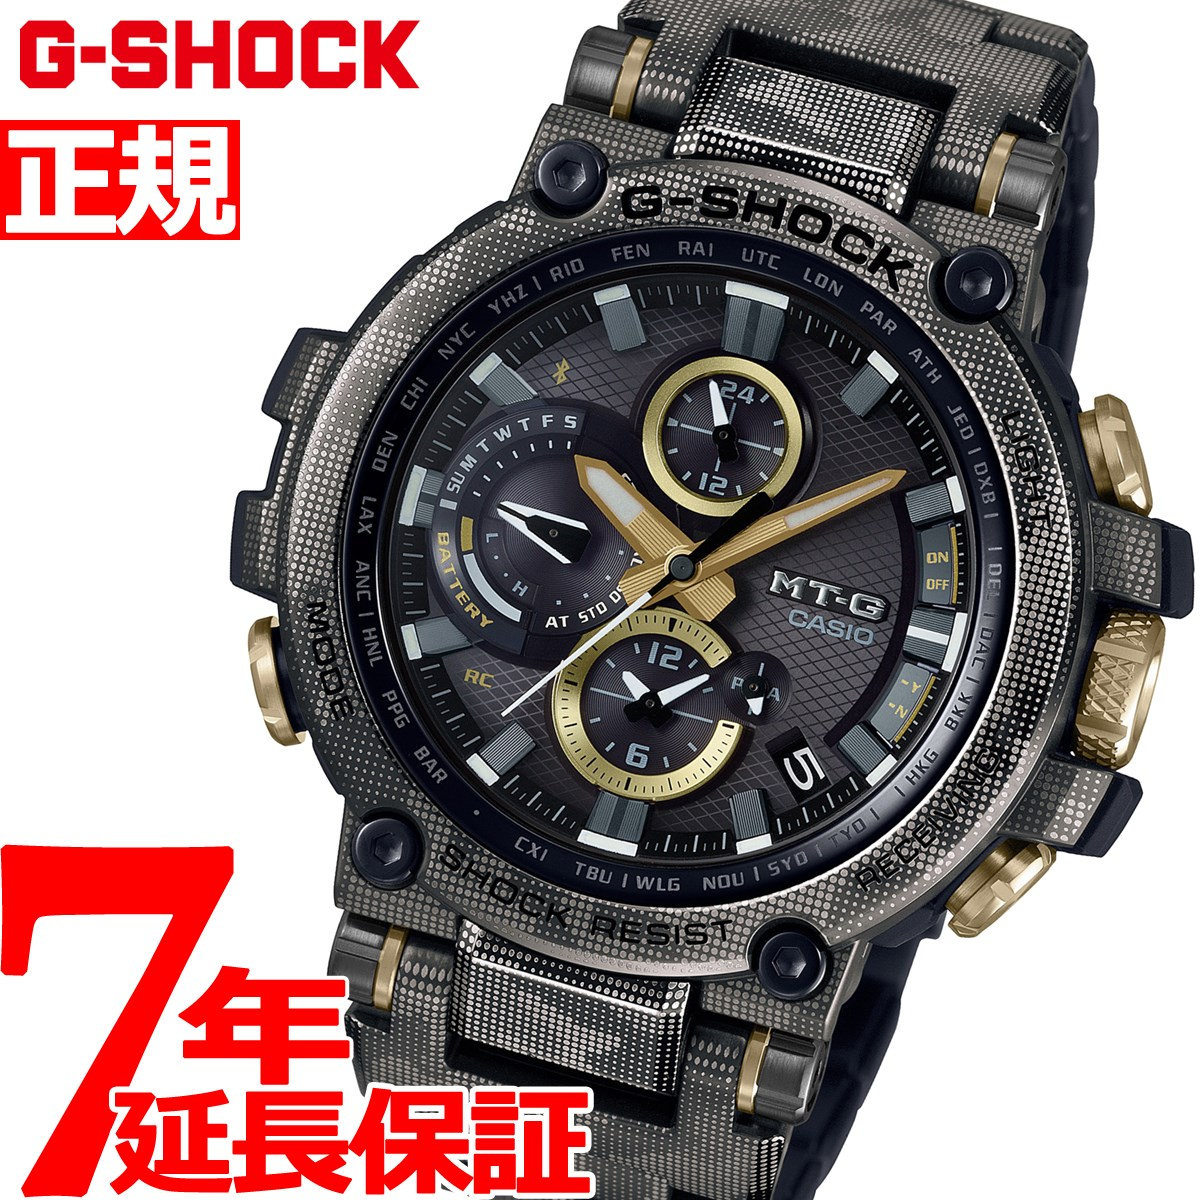 MT-G G-SHOCK 電波 ソーラー 電波時計 カシオ Gショック CASIO 限定モデル 腕時計 メンズ タフソーラー MTG-B1000DCM-1AJR